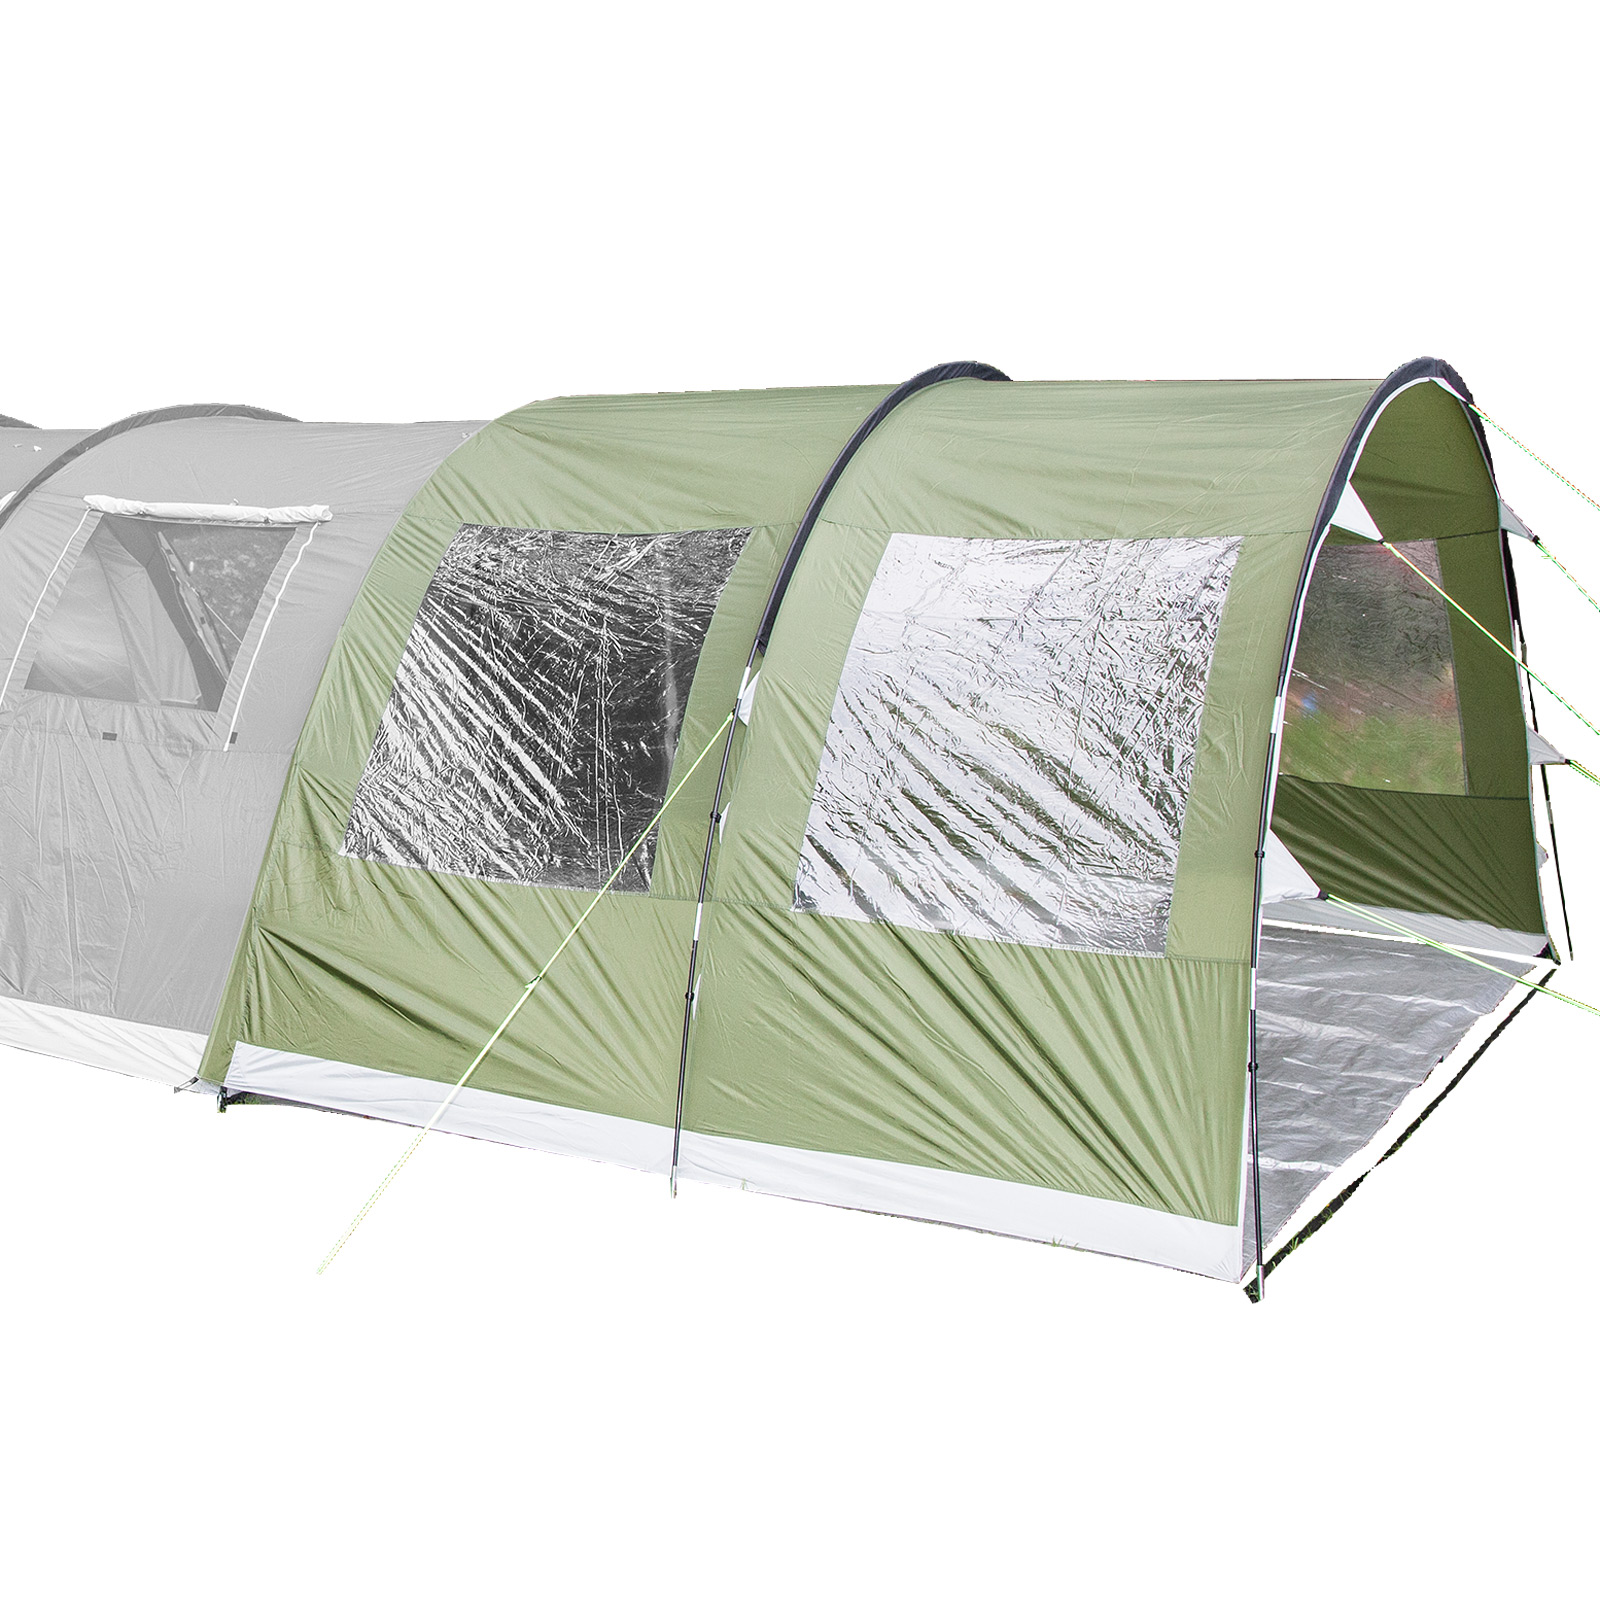 vorzelt skandika canopy gotland 5 personen gr n max trader gmbh. Black Bedroom Furniture Sets. Home Design Ideas